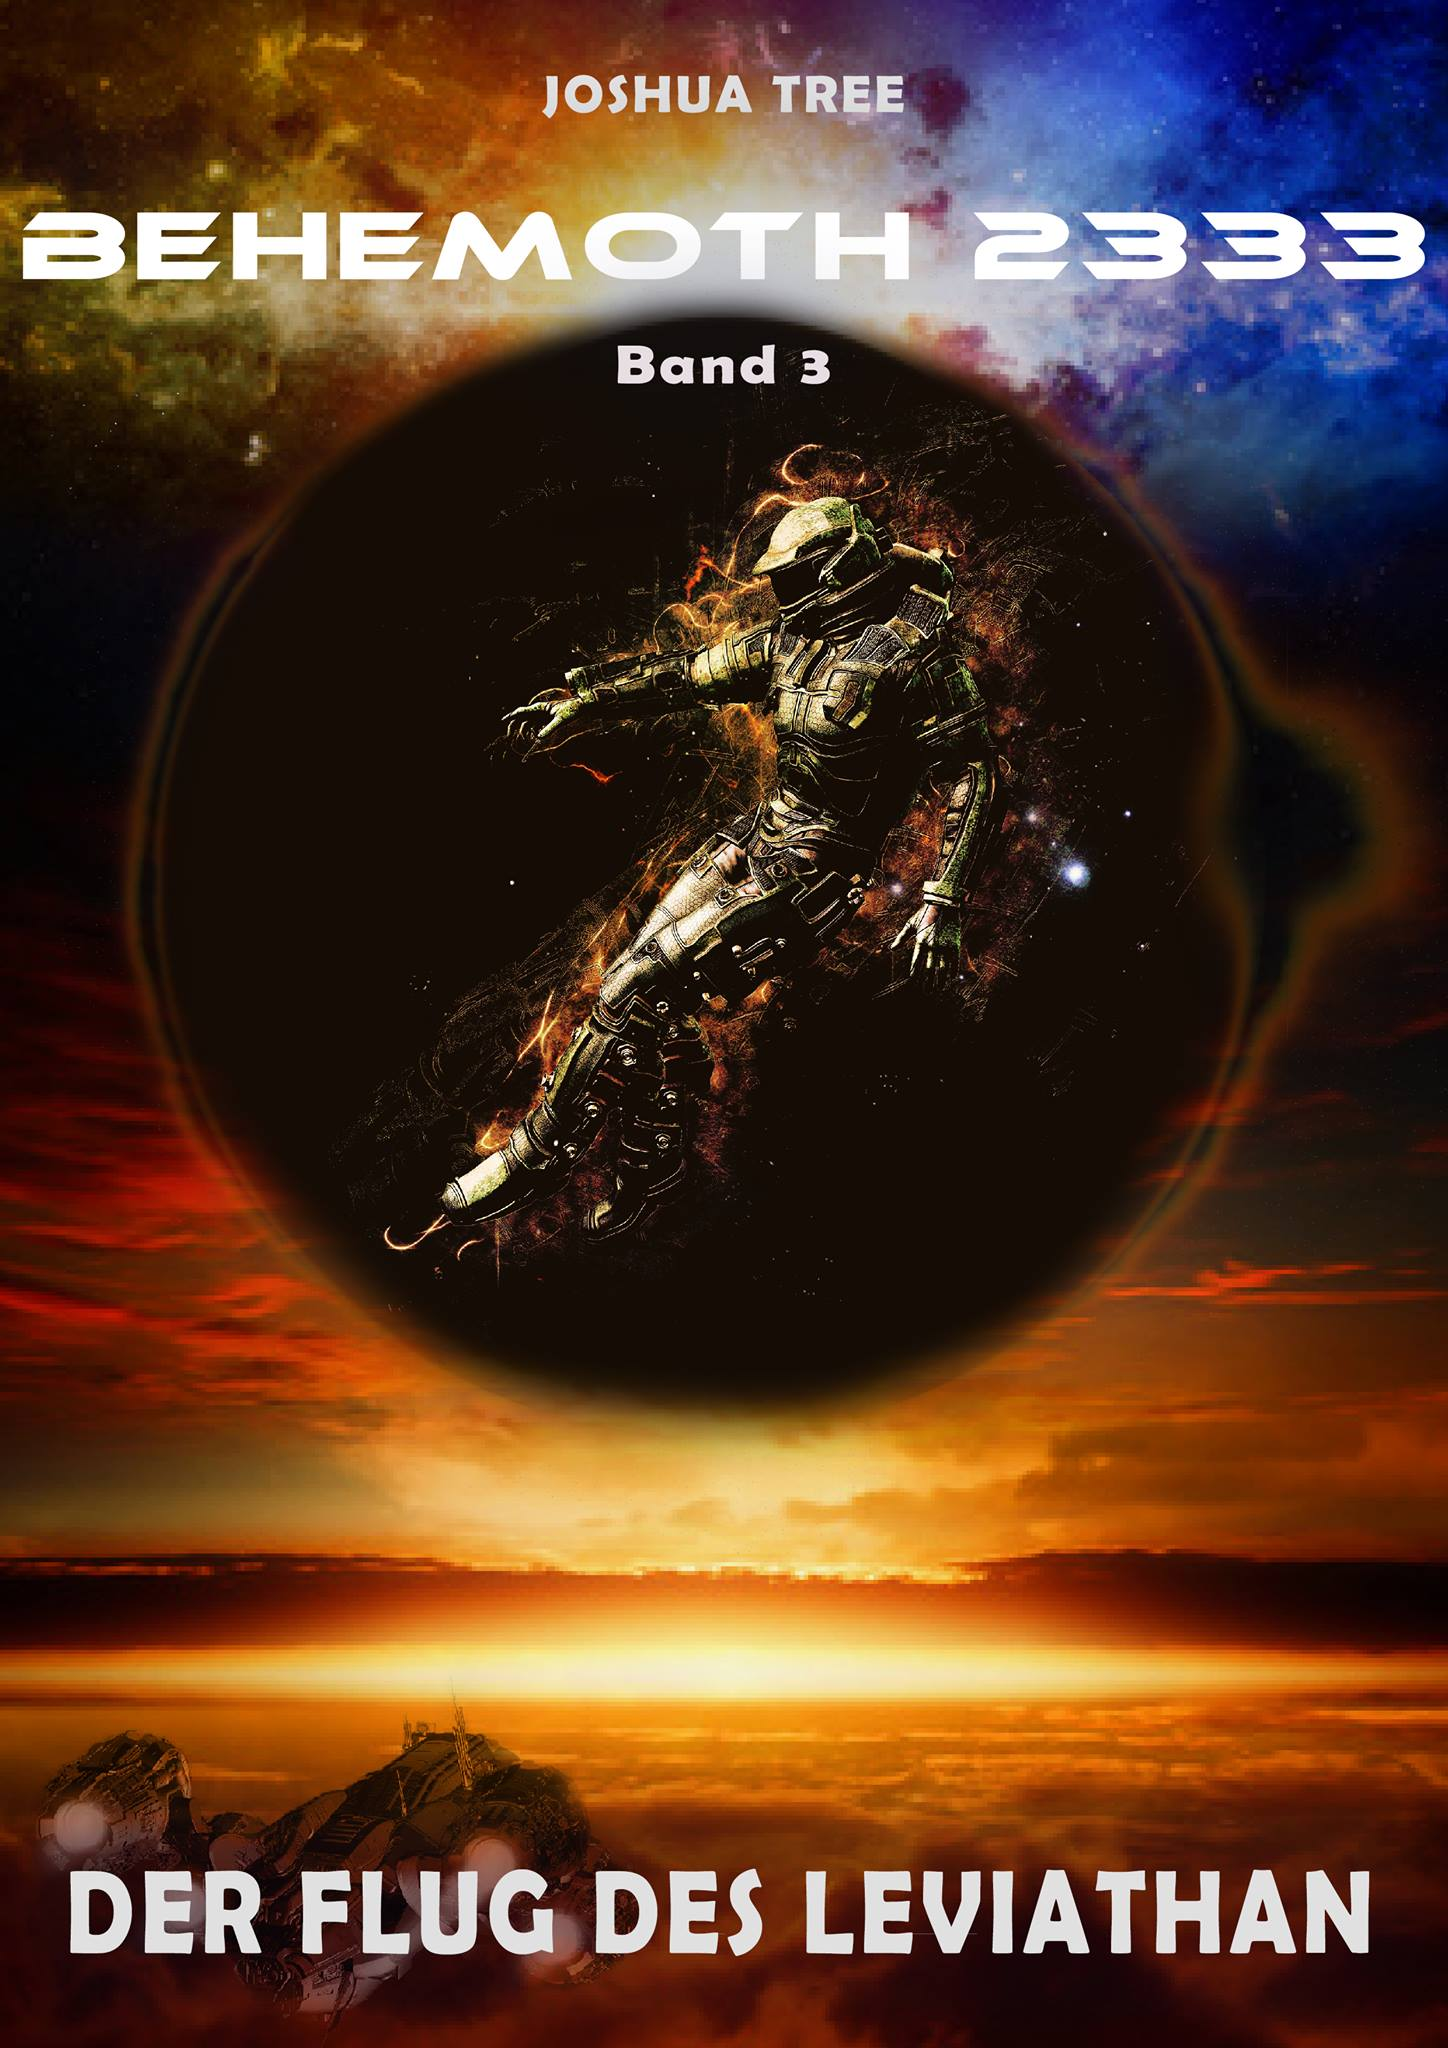 Behemoth 2333 - Band 03 Der Flug des Leviathan - Joshua Tree